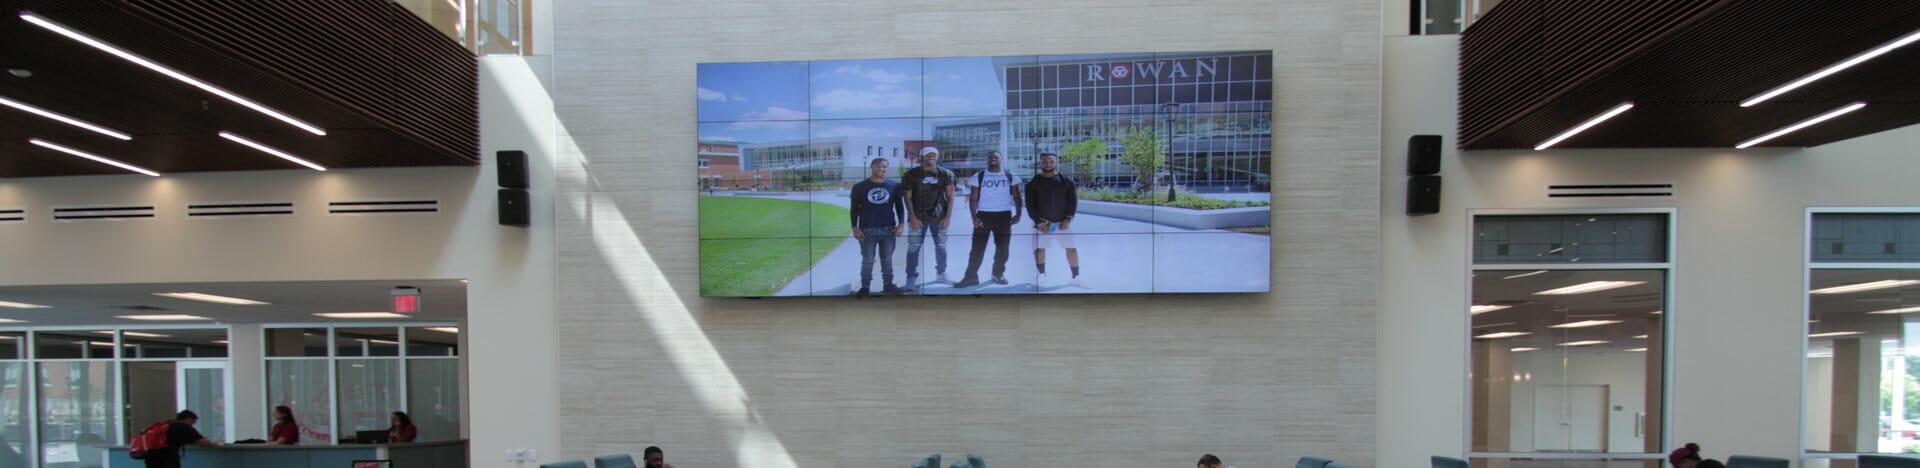 video wall in lobby